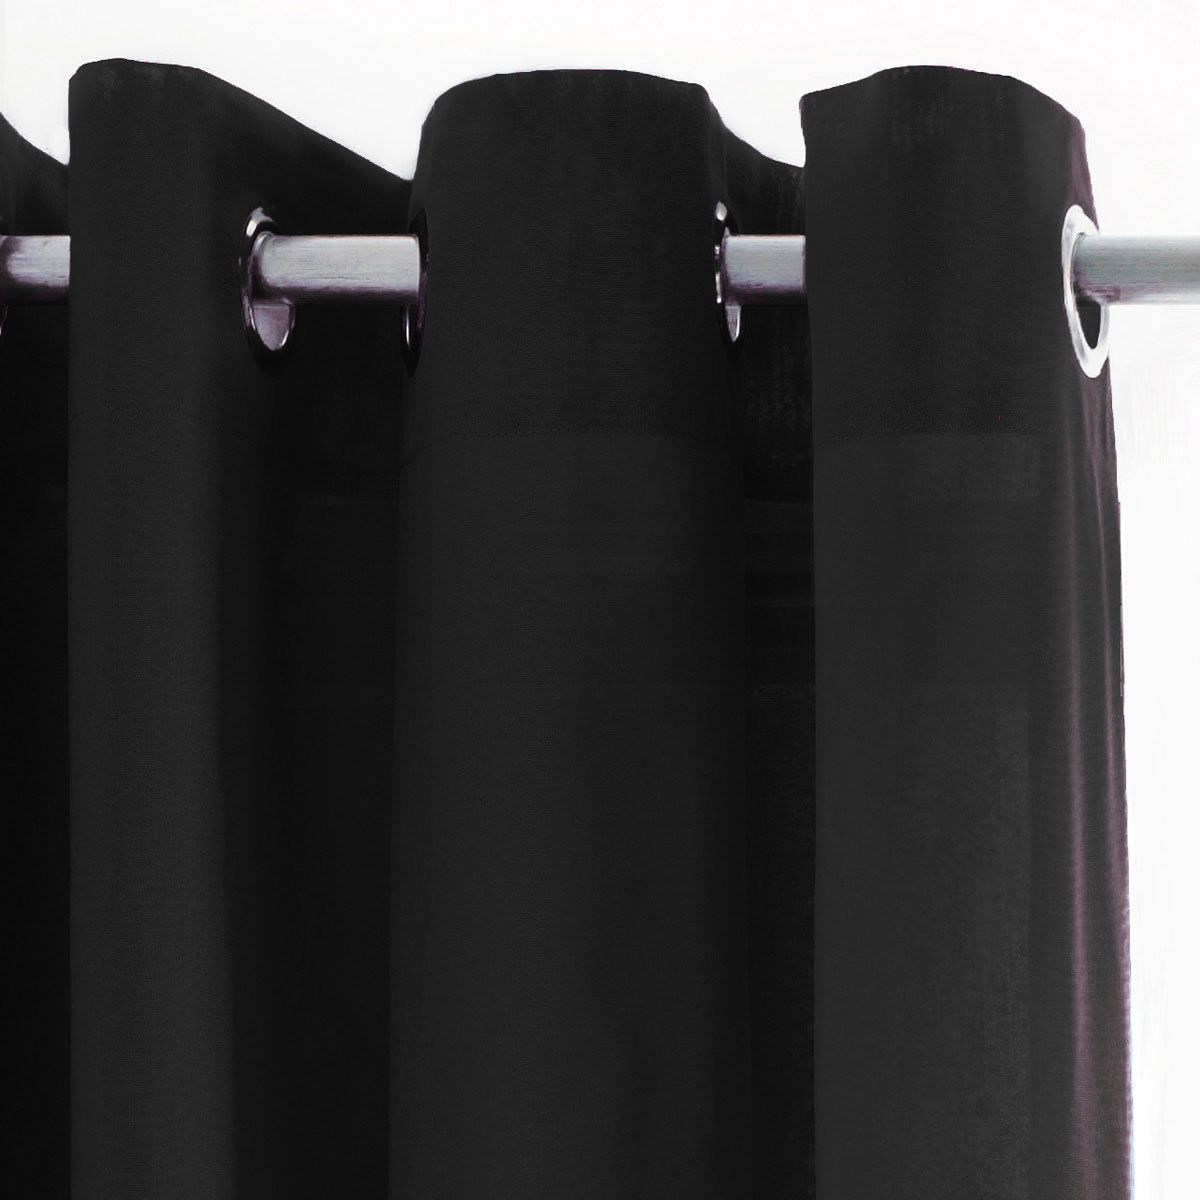 Rideau Uni cusco noir 135x240cm